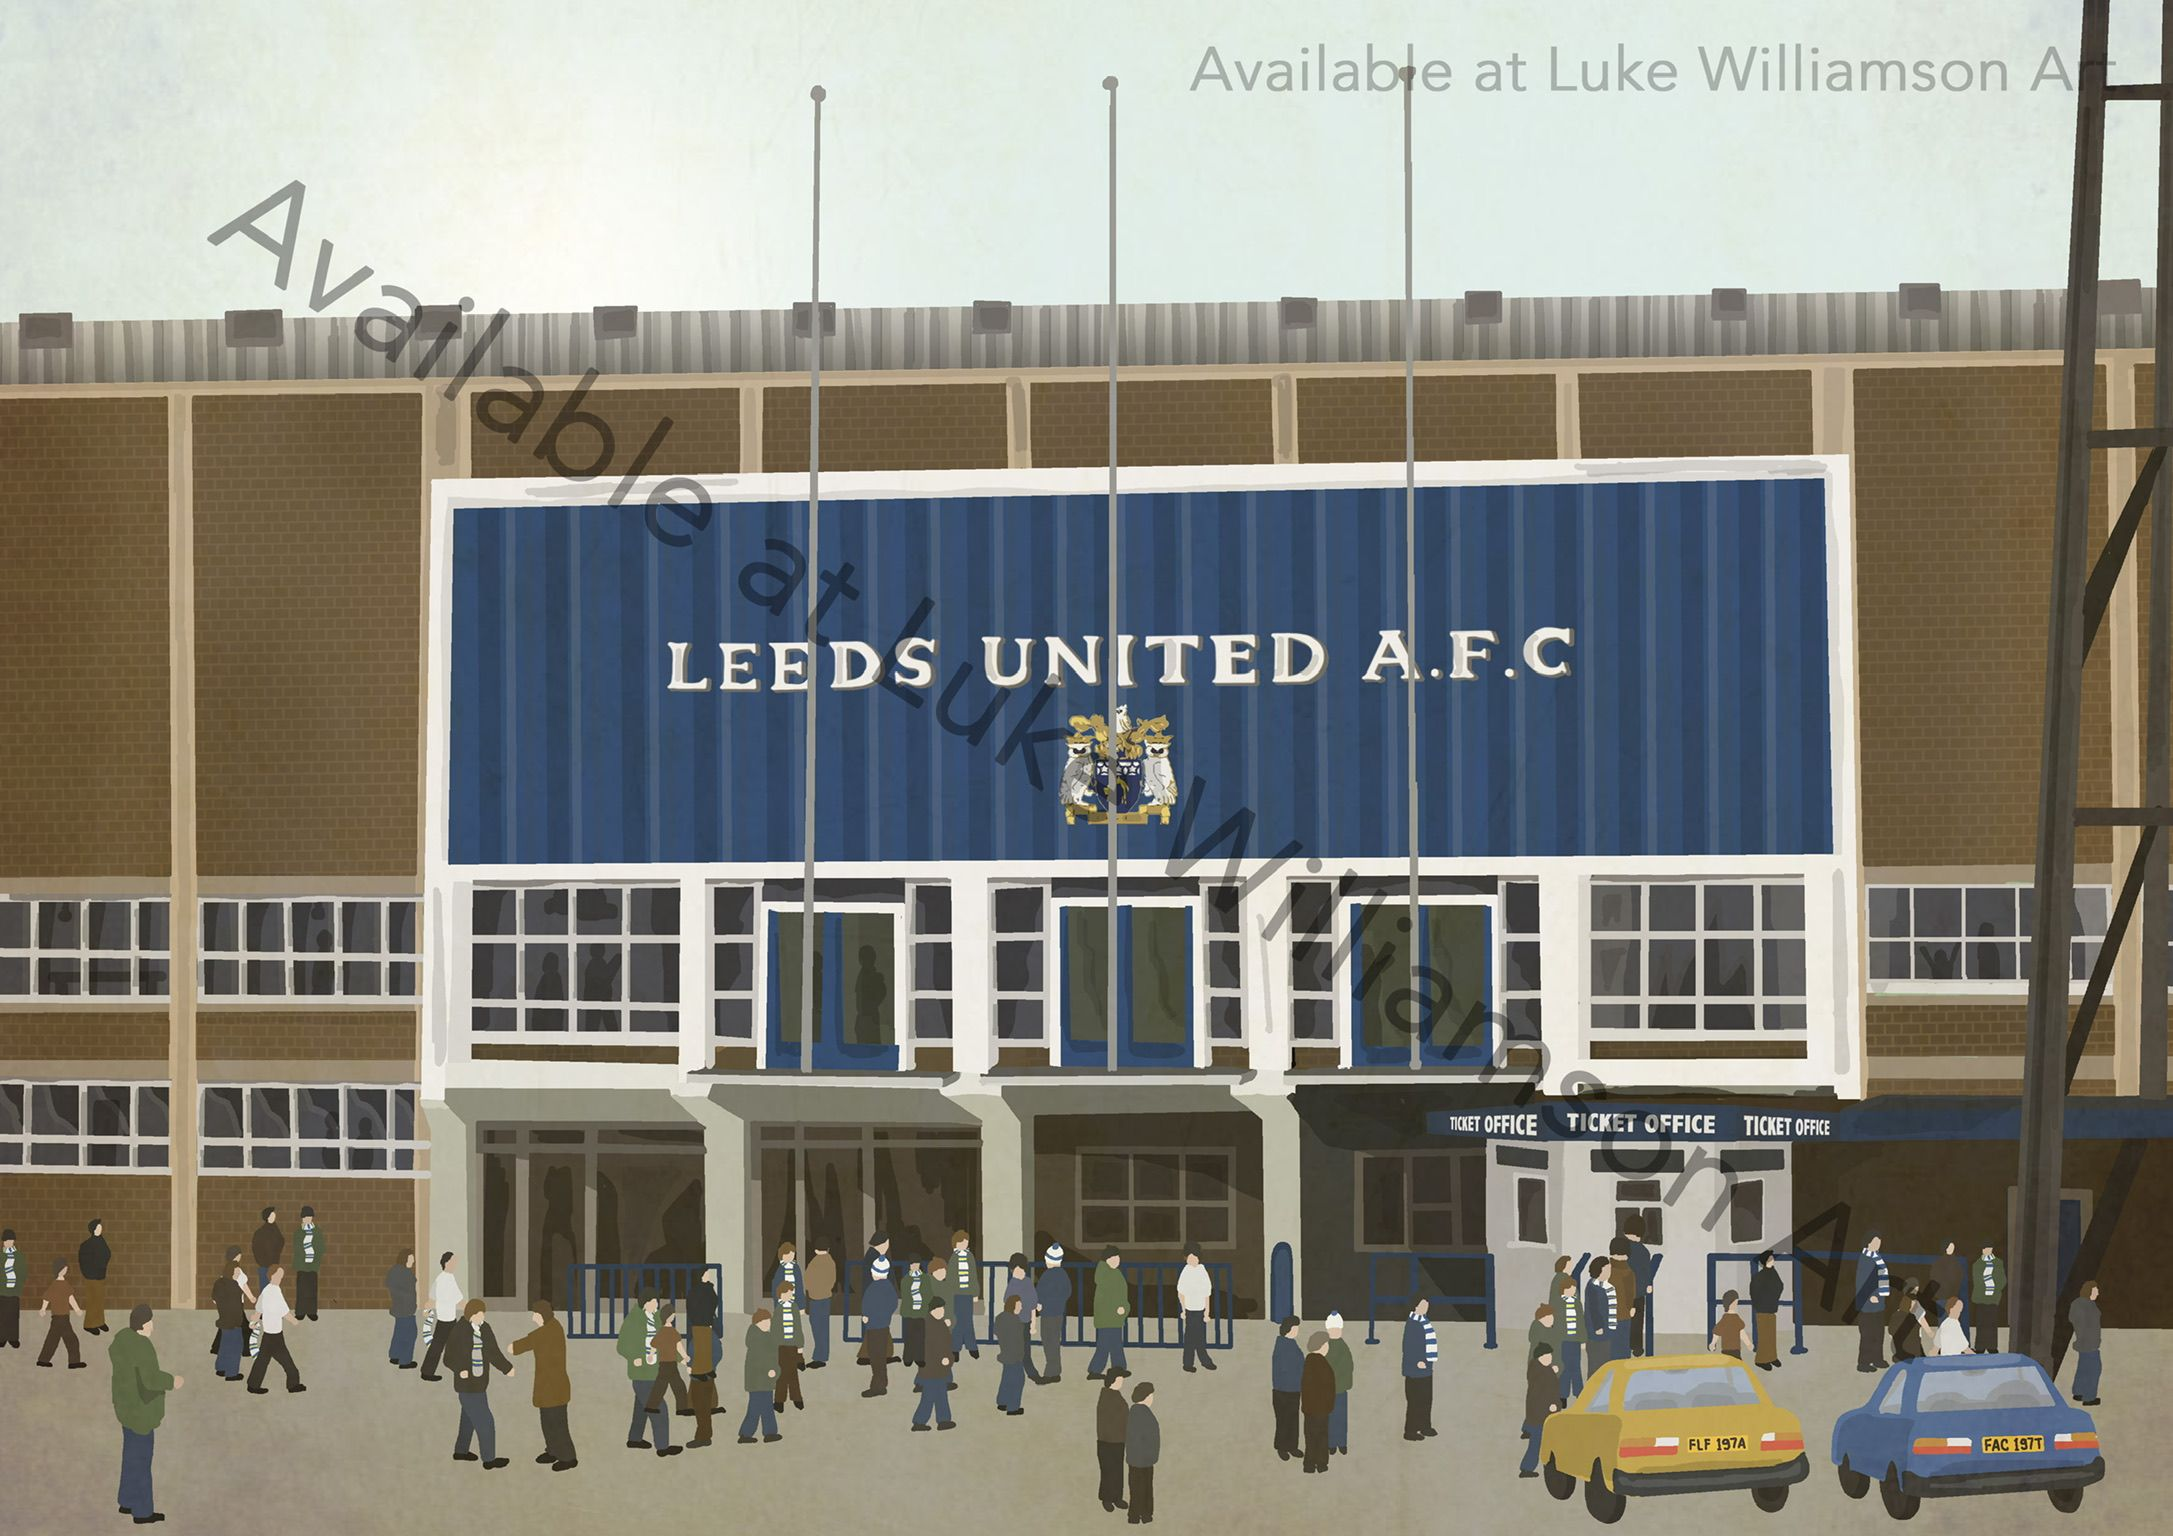 Leeds United Elland Road Art Print Photo Picture Poster A3 A4